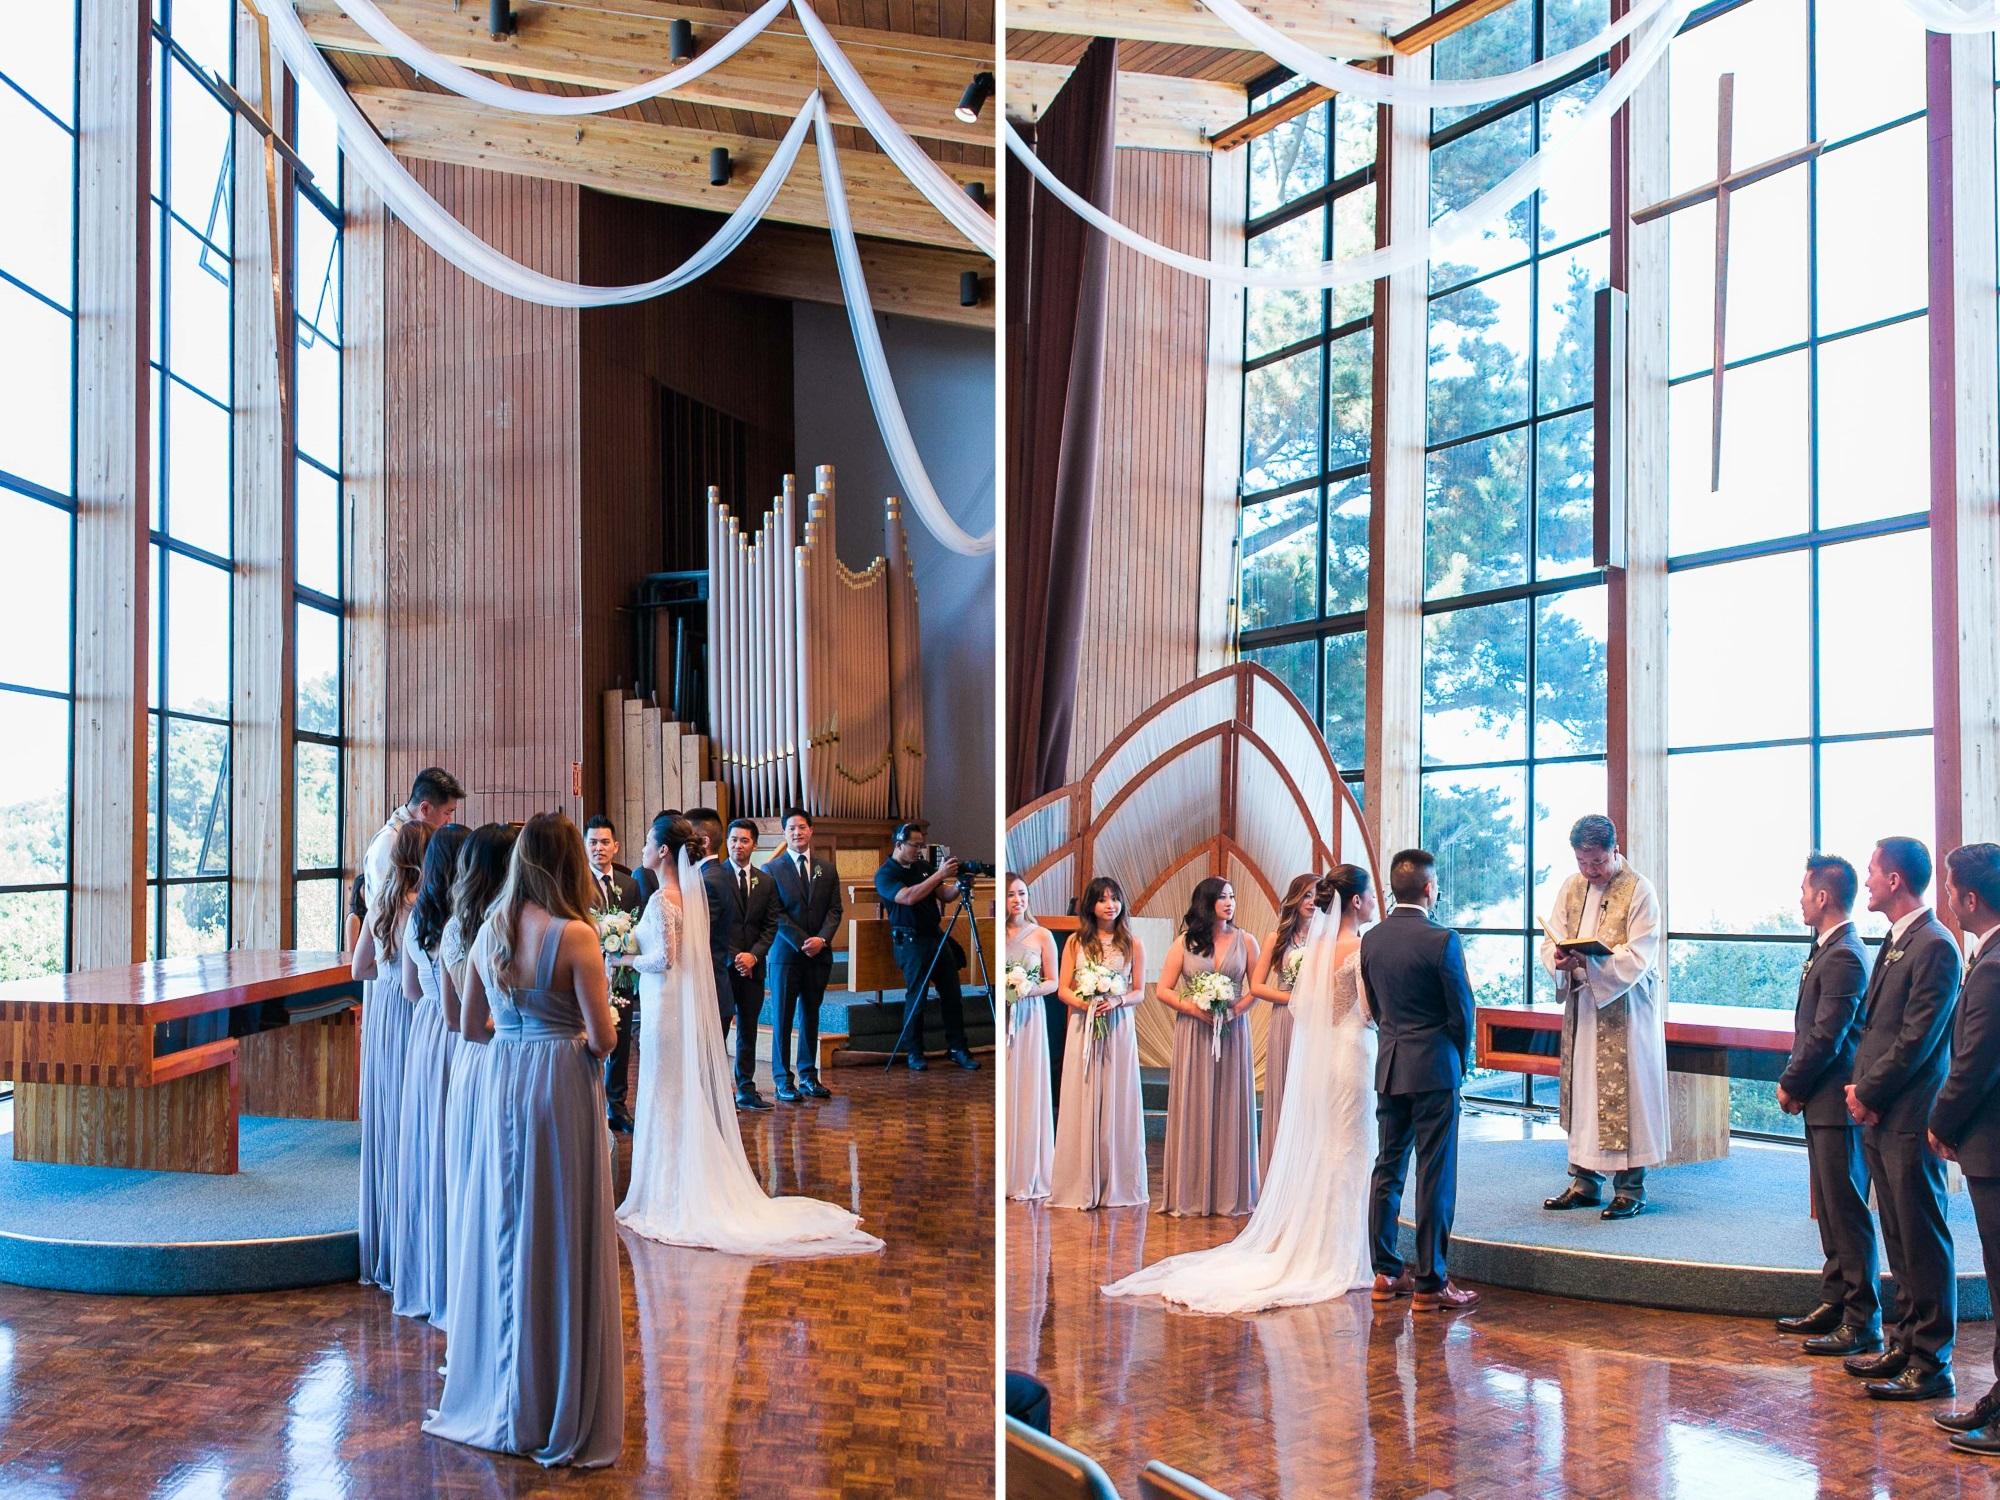 Wedding at Preservation Park in Oakland - Preservation Park Wedding Photos by JBJ Pictures San Francisco Photographer (39).jpg